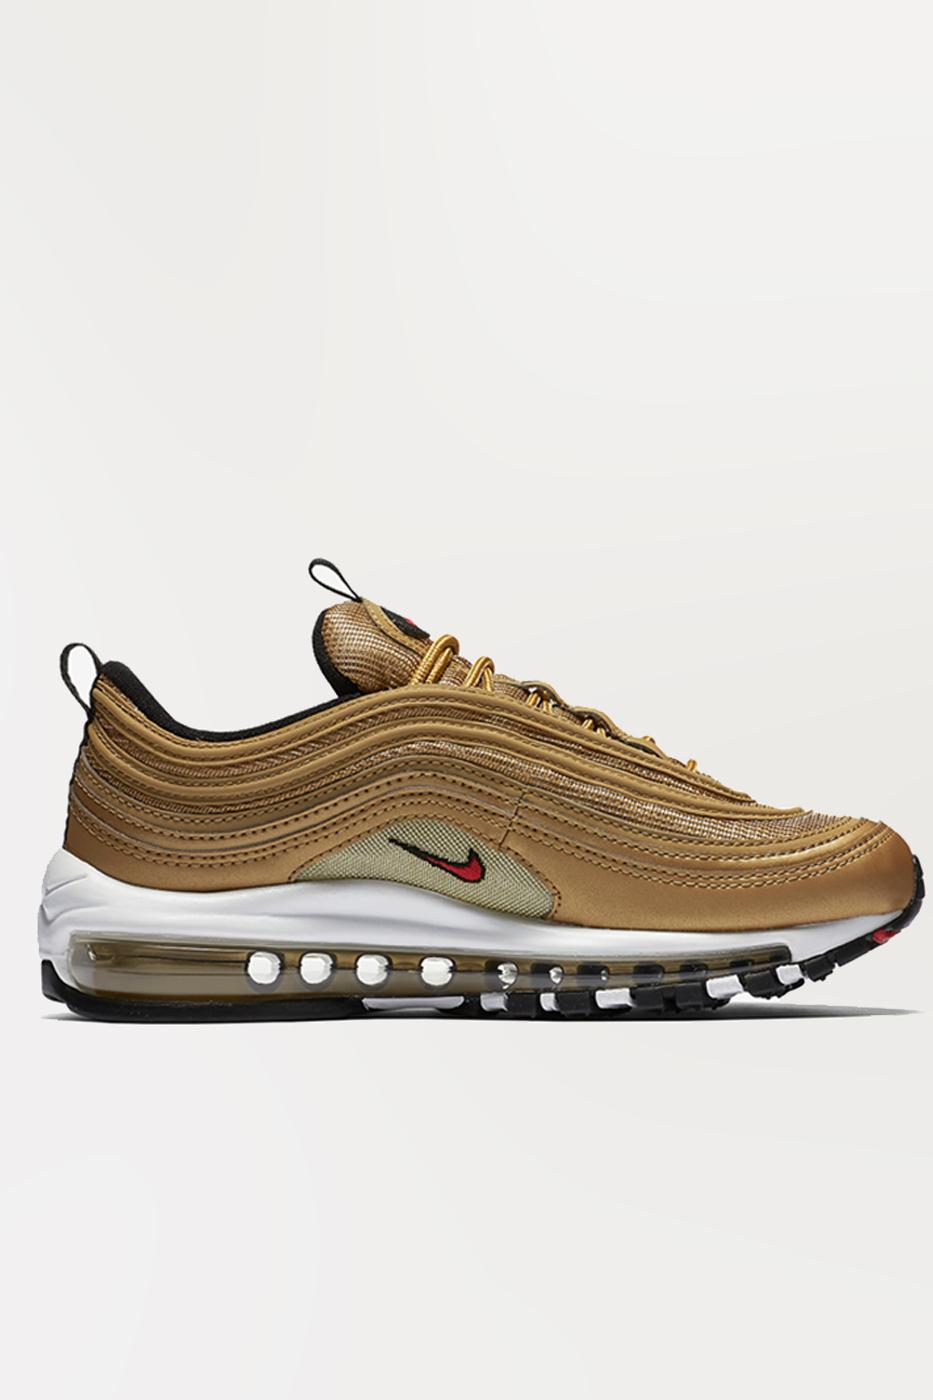 Nike Air Max 97 OG Silver & Gold   Animal Tracks